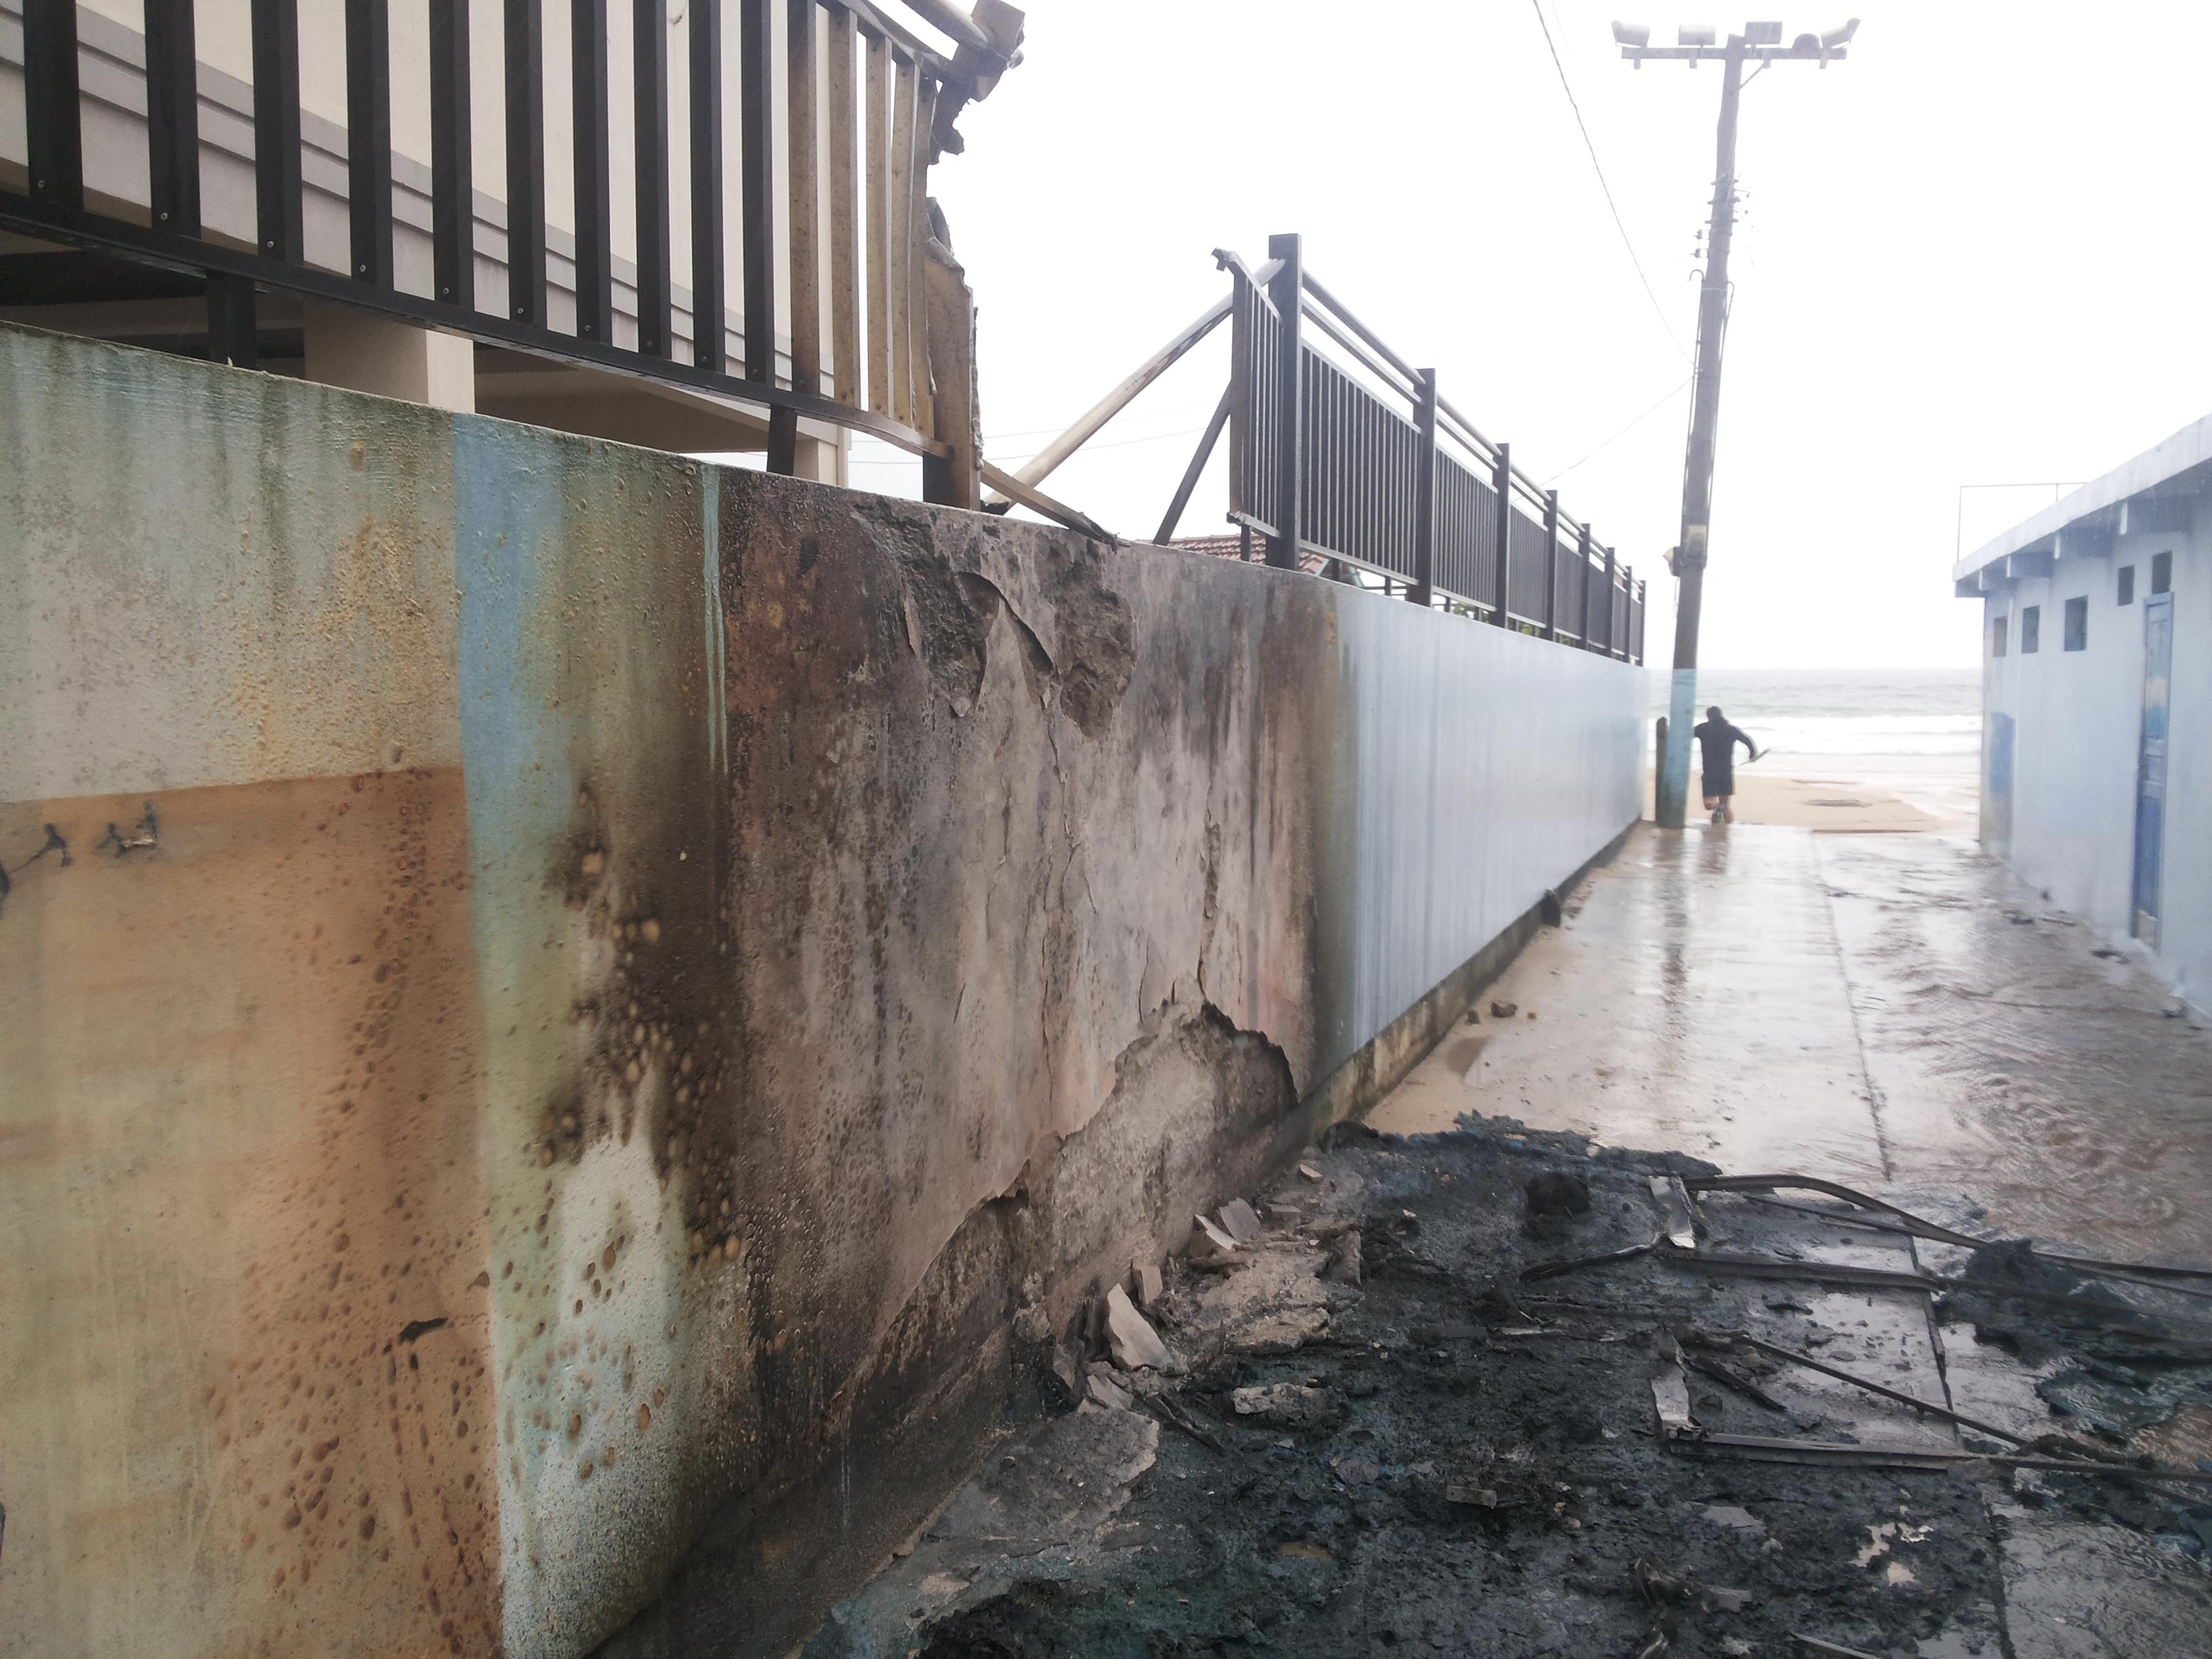 banheiros-fogo-ingleses-vandalismo-cerca